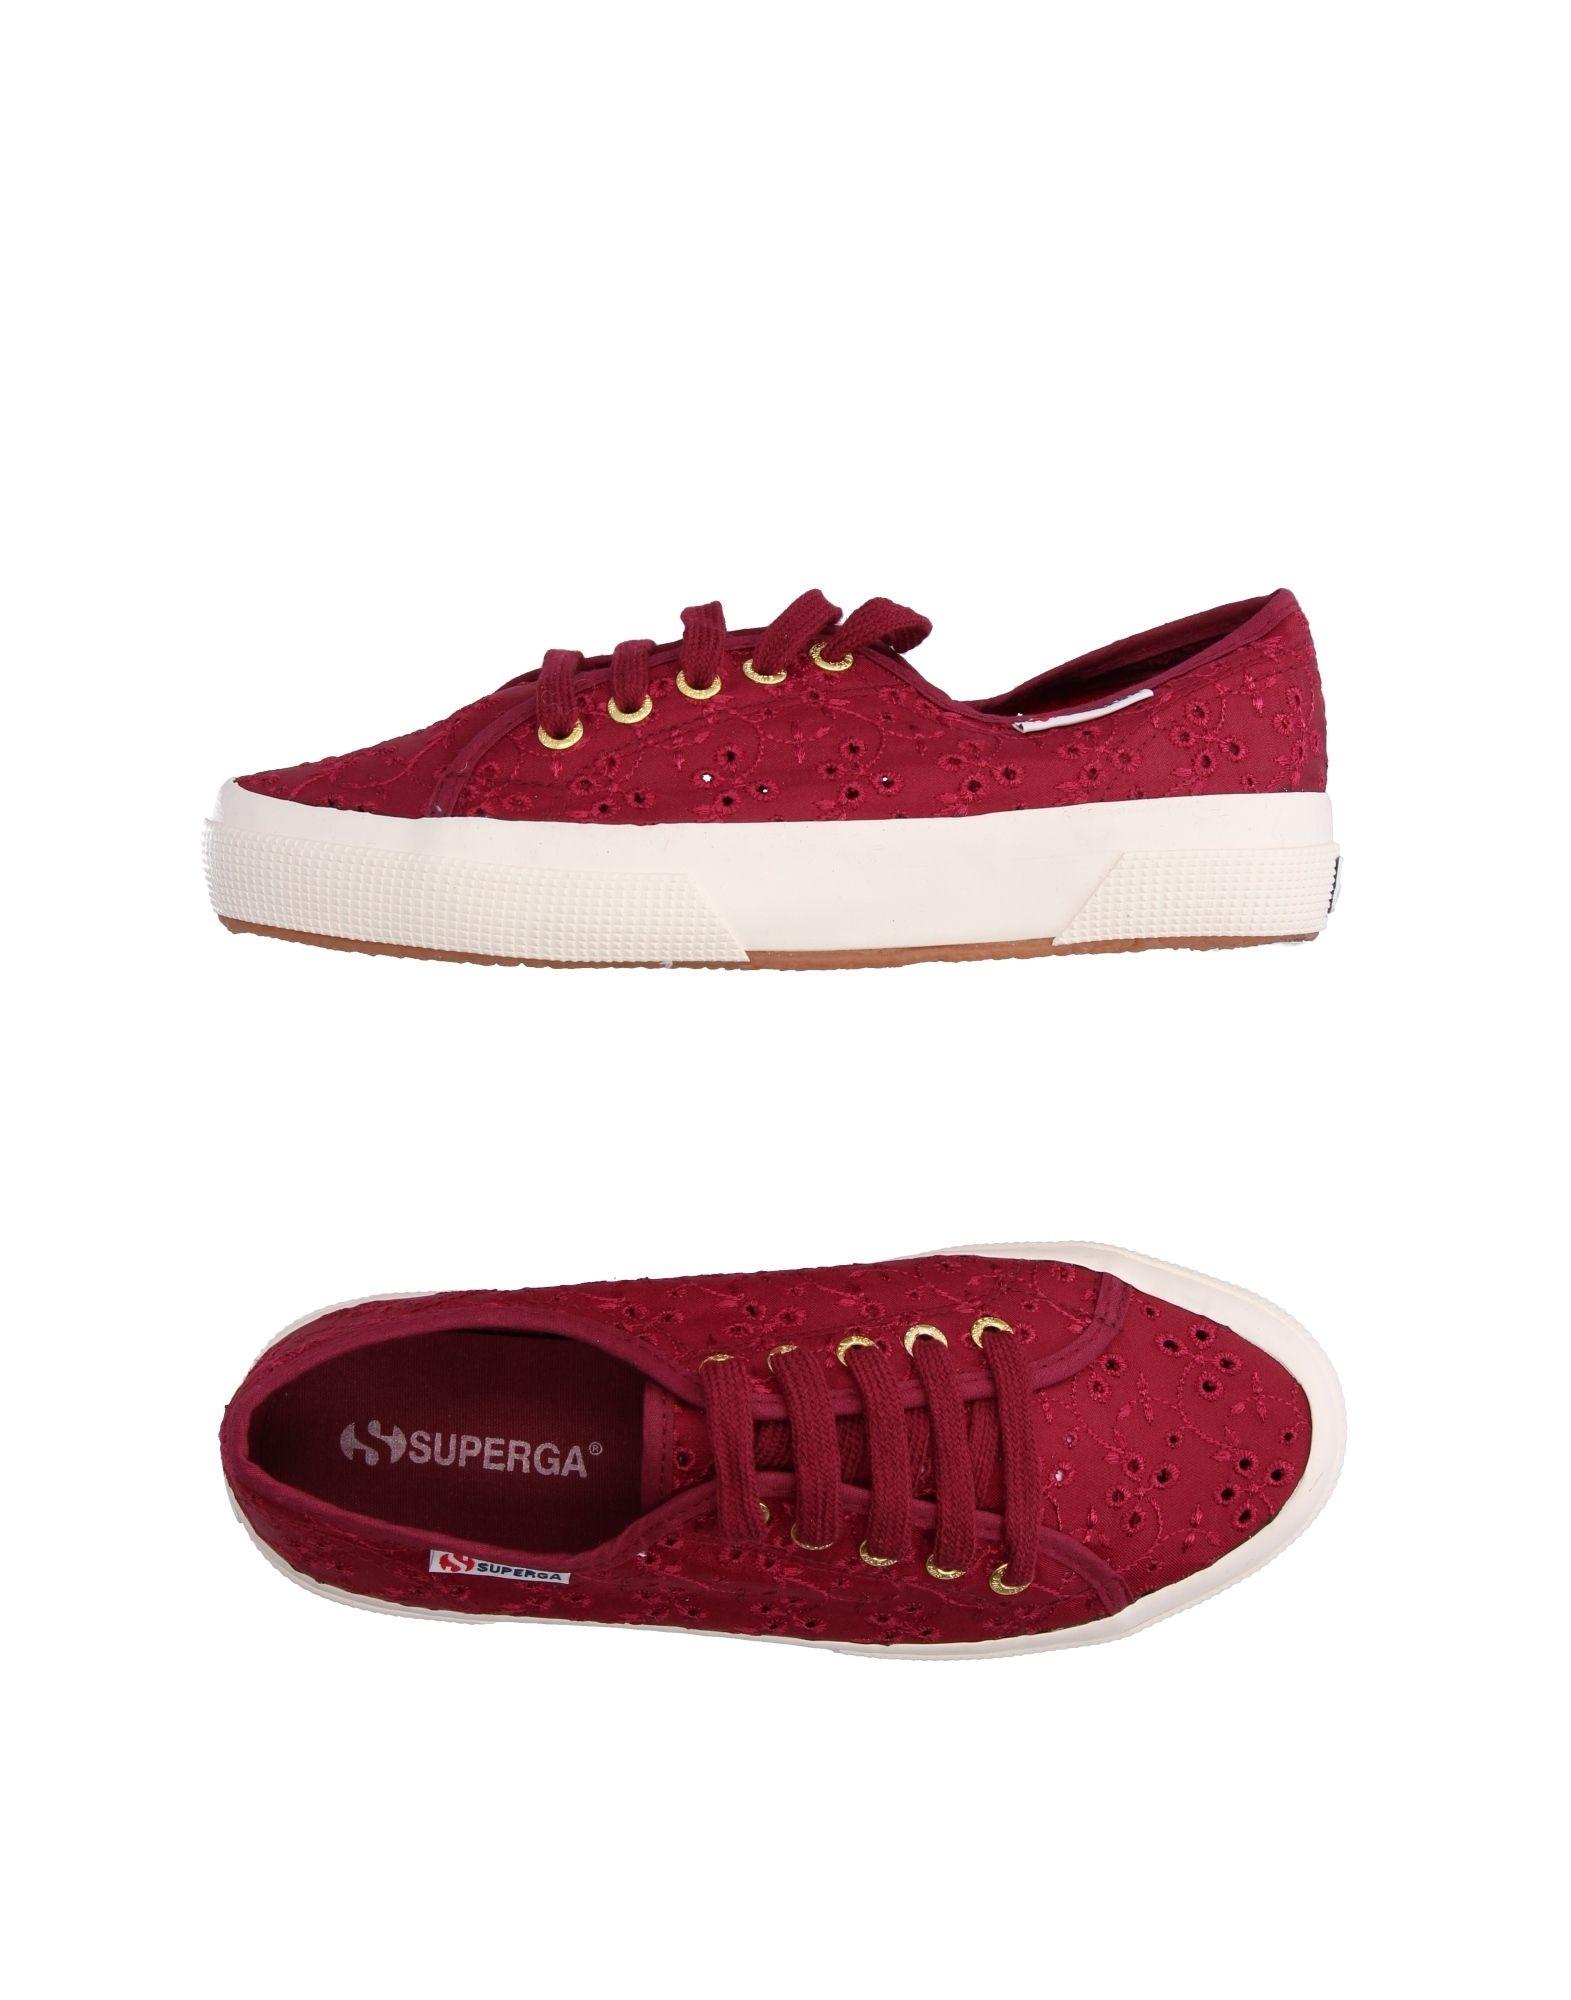 Superga® Sneakers Damen  11173928FC Schuhe Gute Qualität beliebte Schuhe 11173928FC abd5af